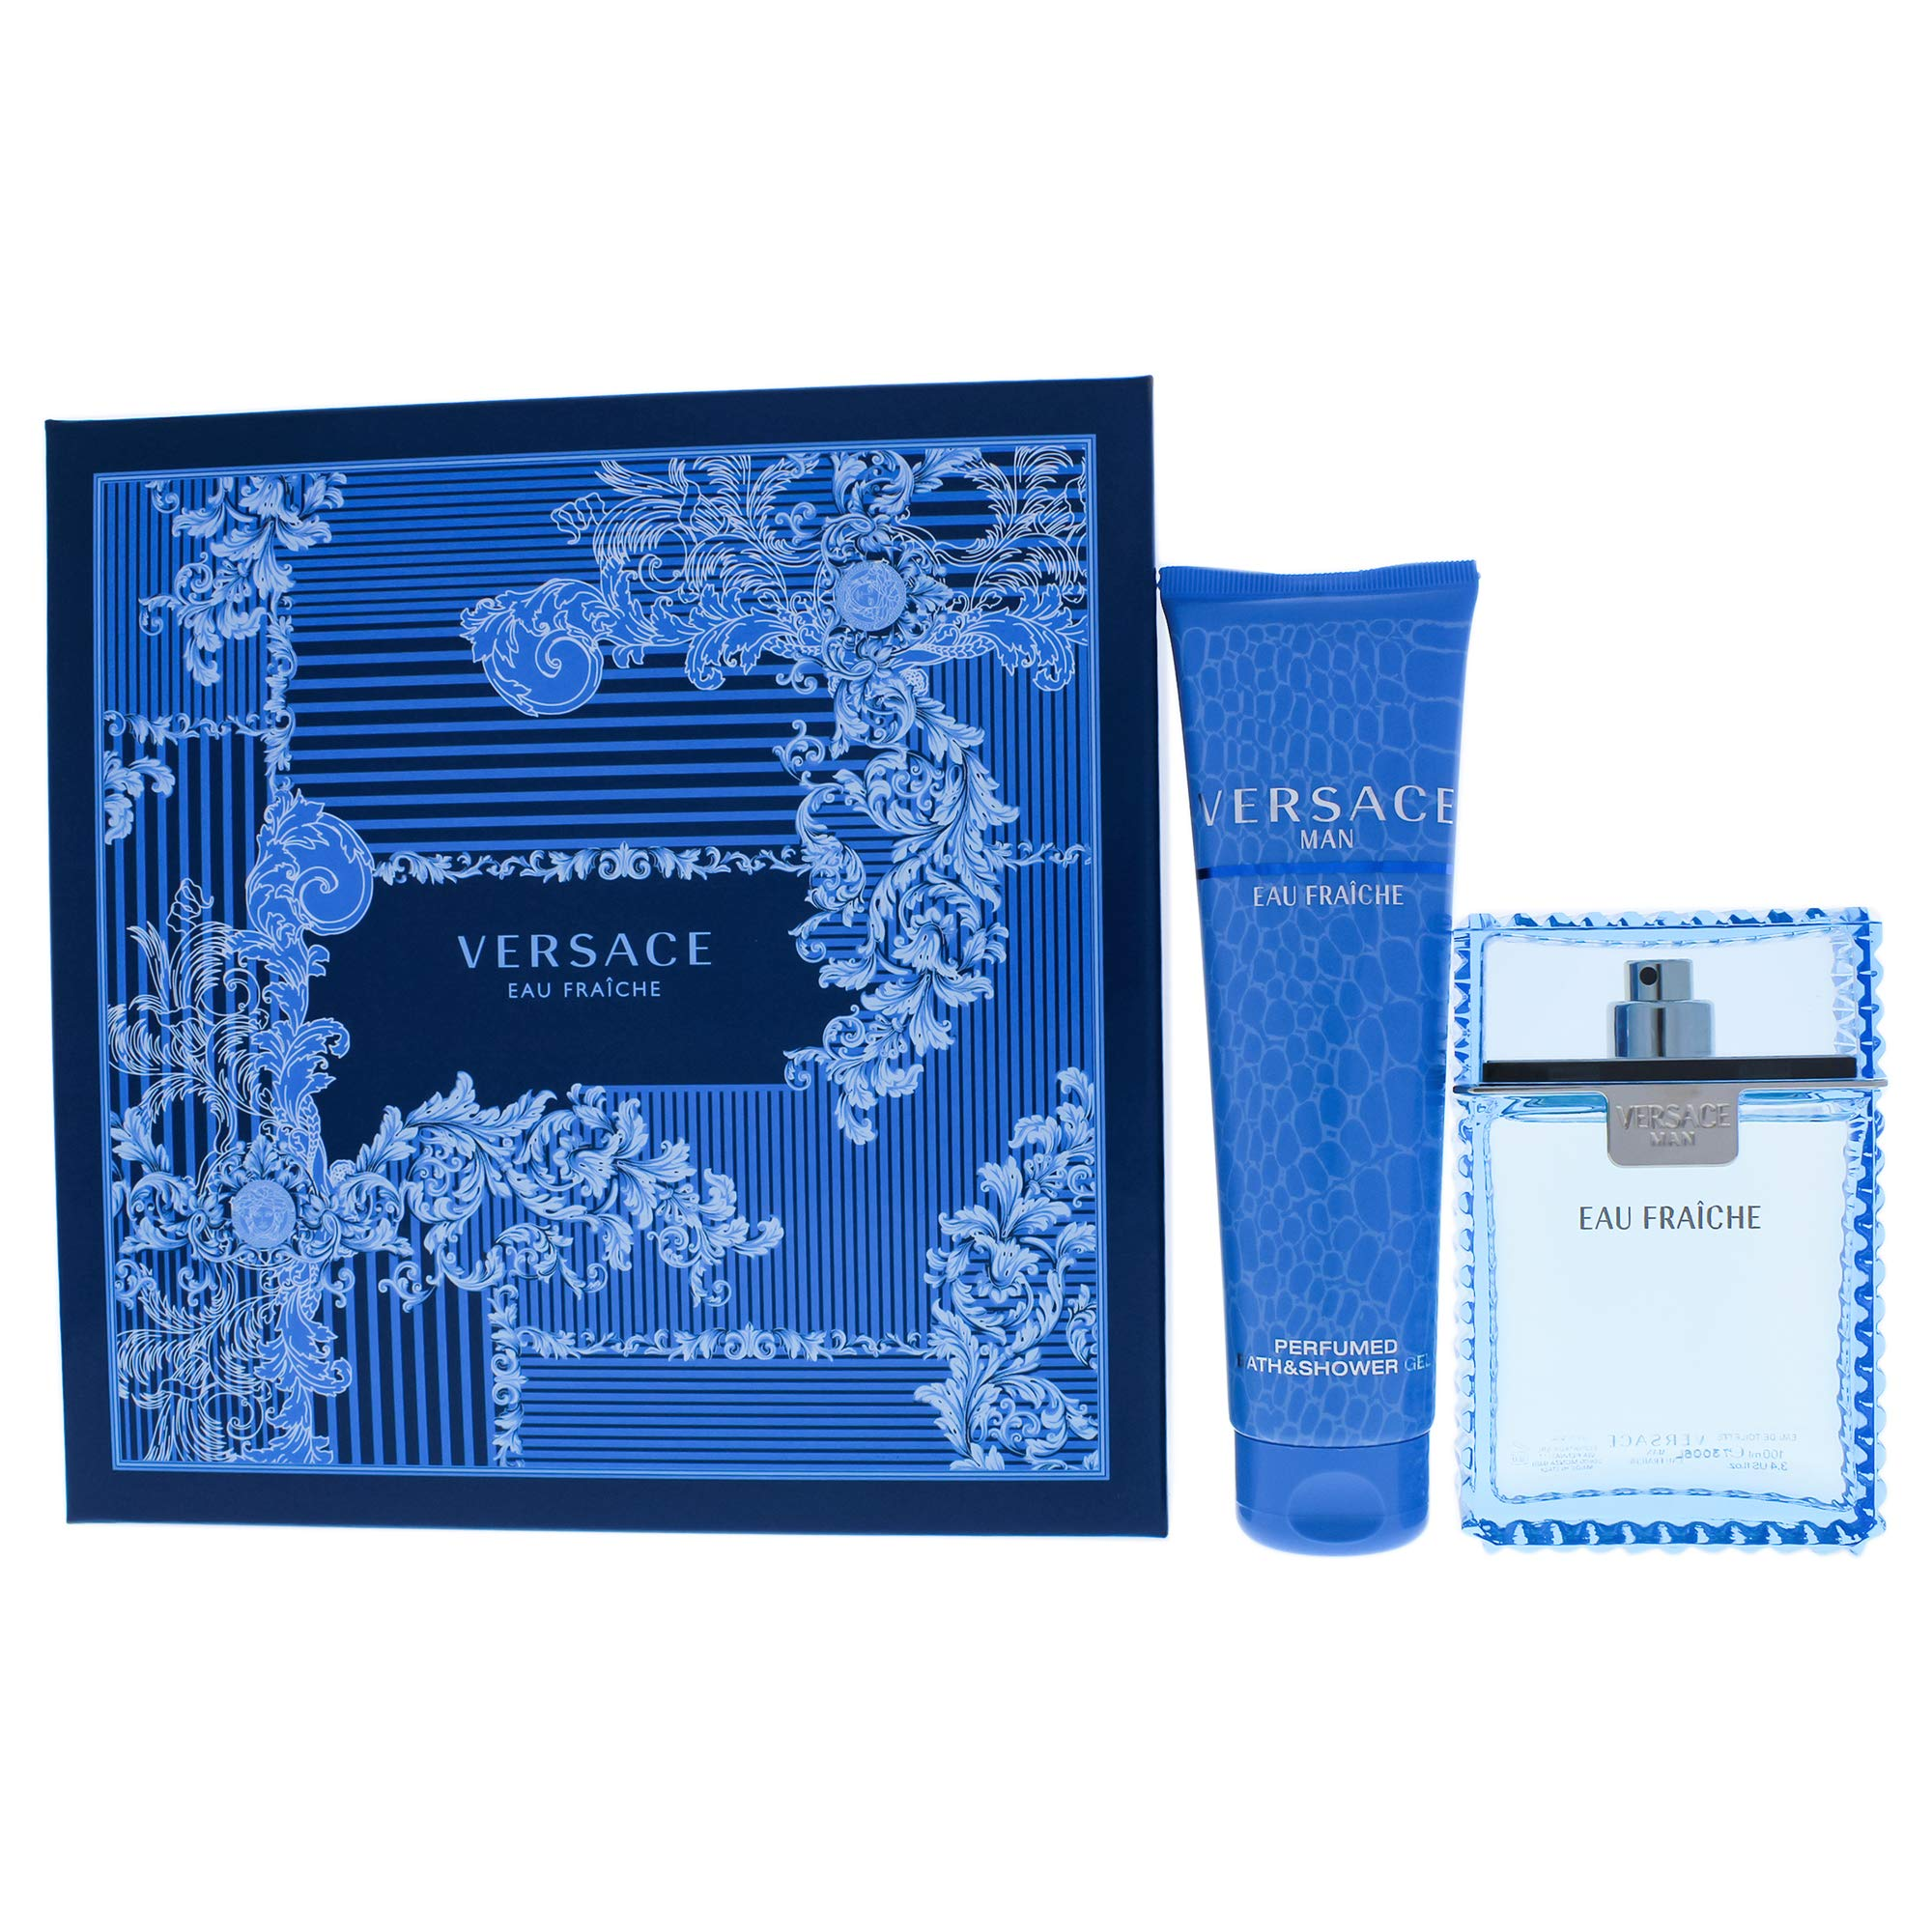 Versace Man Eau Fraiche by Versace for Men - 2 Pc Gift Set 3.4oz EDT Spray, 5oz Perfumed Bath and Shower Gel